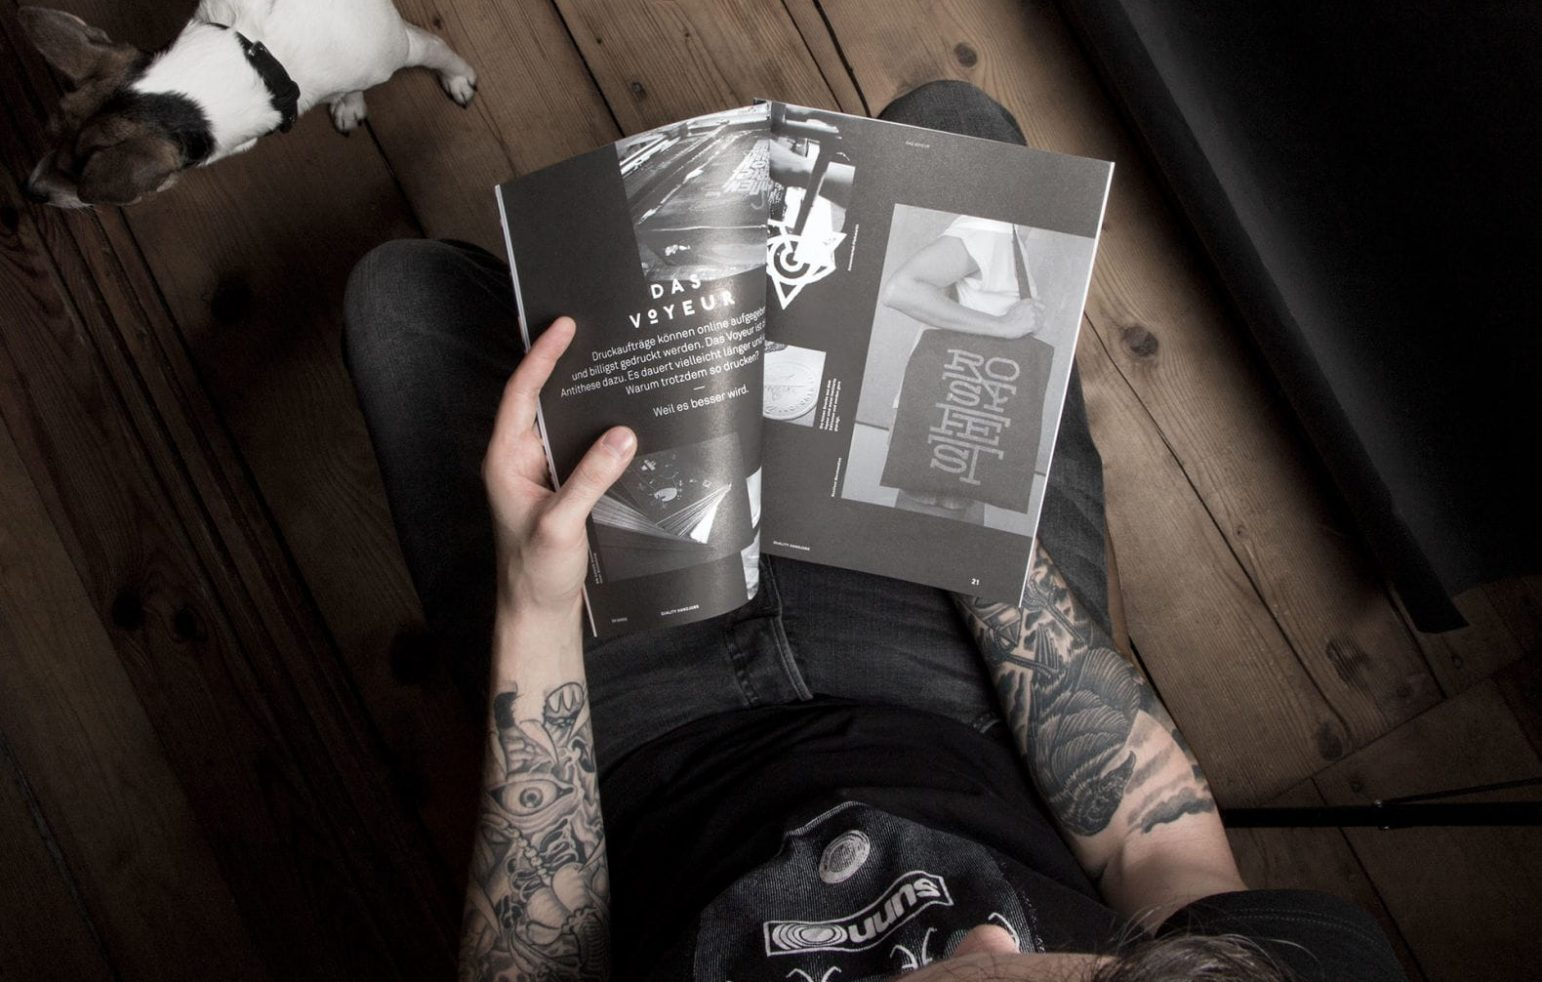 rasmusundchristin-engarde-magazine-9